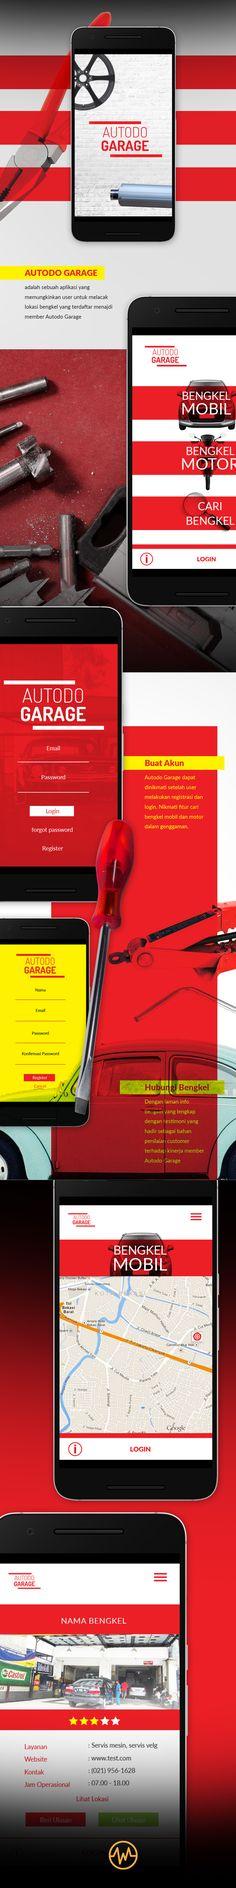 Background Spanduk Bengkel Motor - contoh desain spanduk